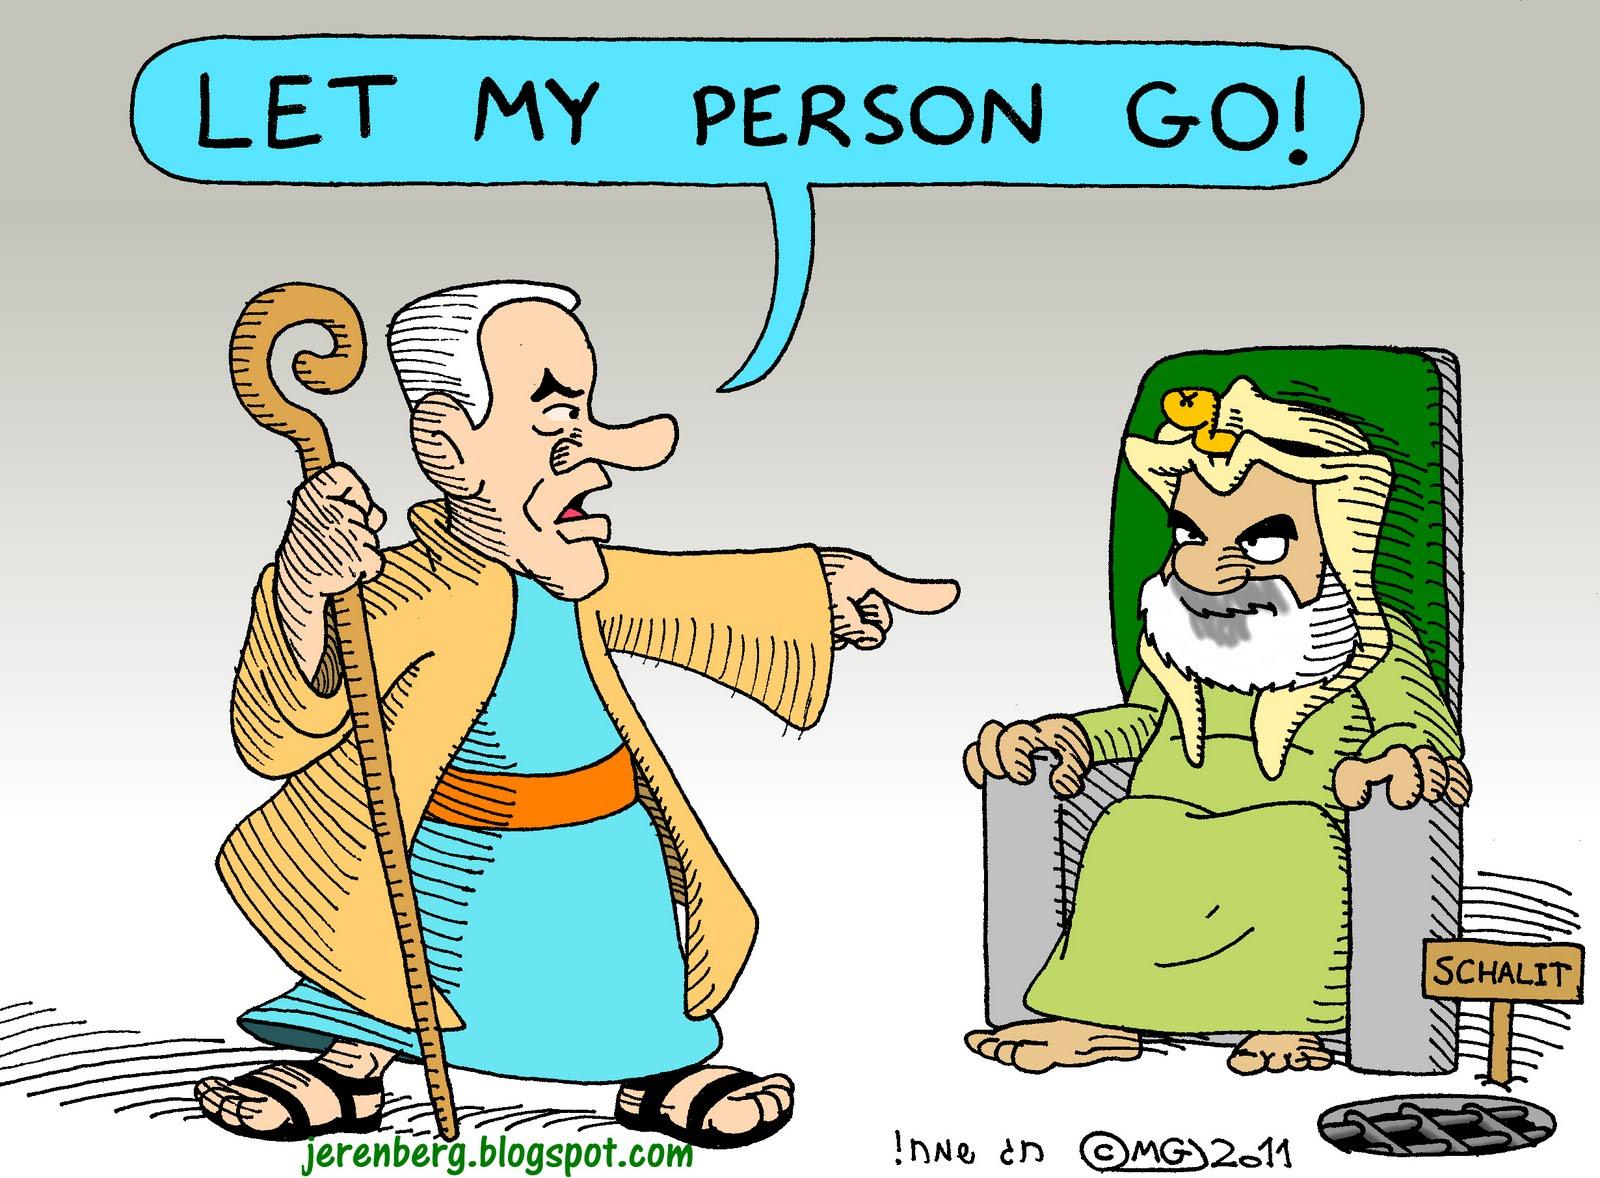 The Eighth Day: Last week's jpost.com cartoon